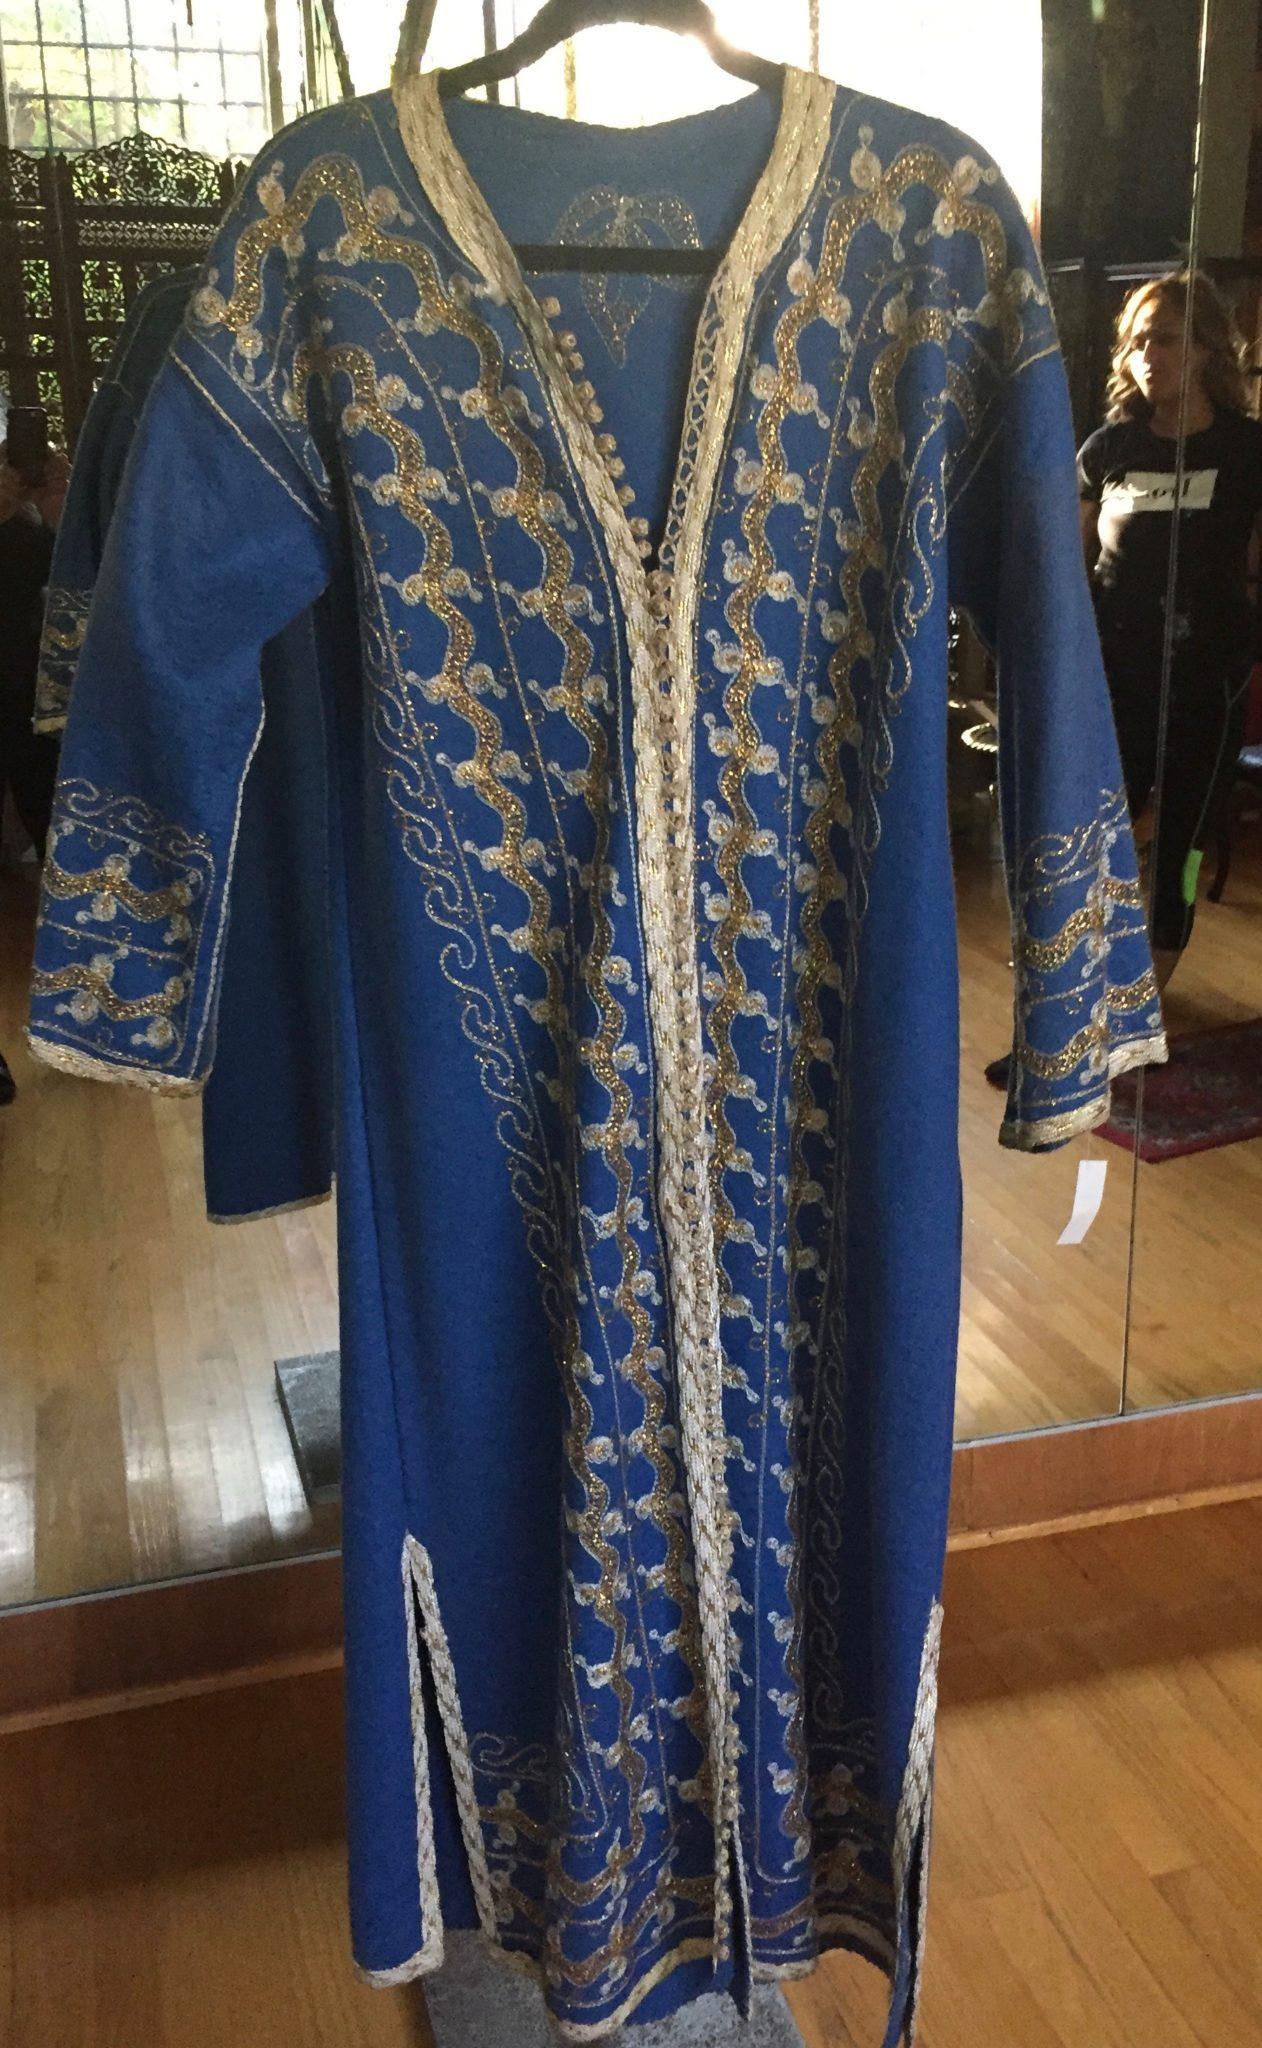 Wool Felt Caftan - Moroccan Caftan: Blue Wool Felt